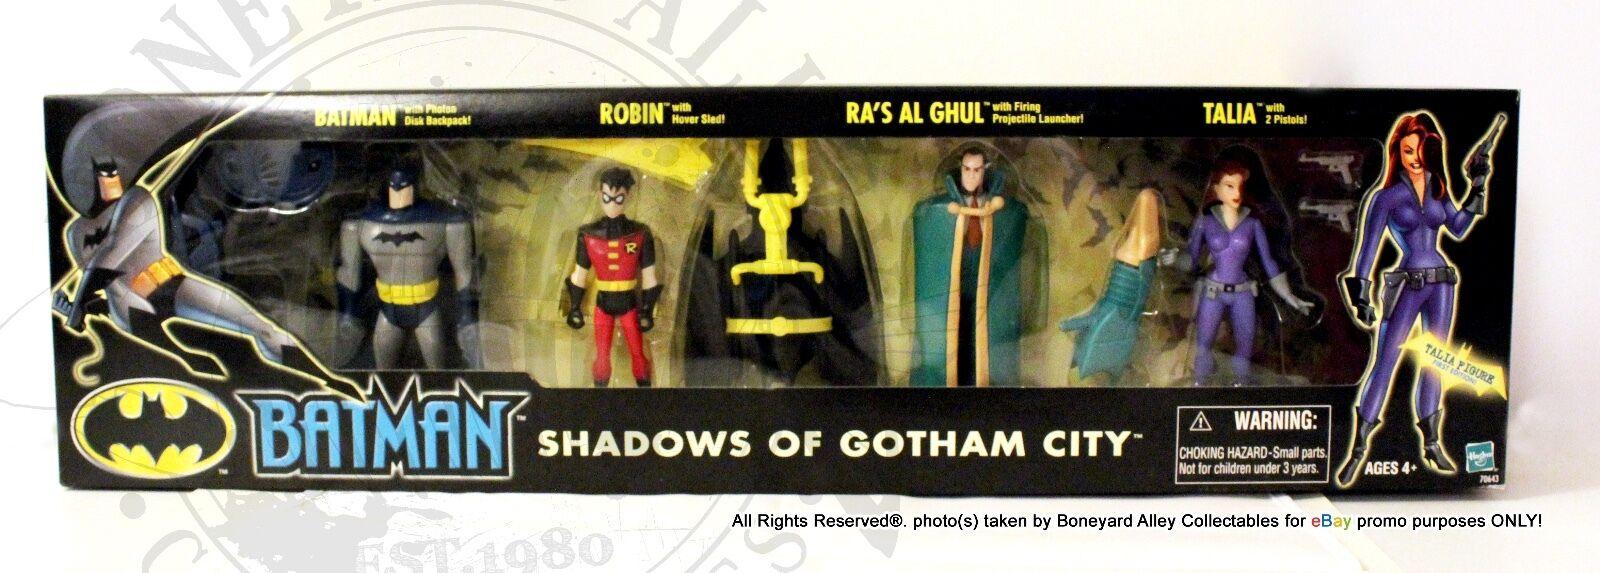 BATMAN TRU Exclusive Exclusive Exclusive SHADOWS OF GOTHAM CITY MISBNEWRARE-HASBRO e74bb9